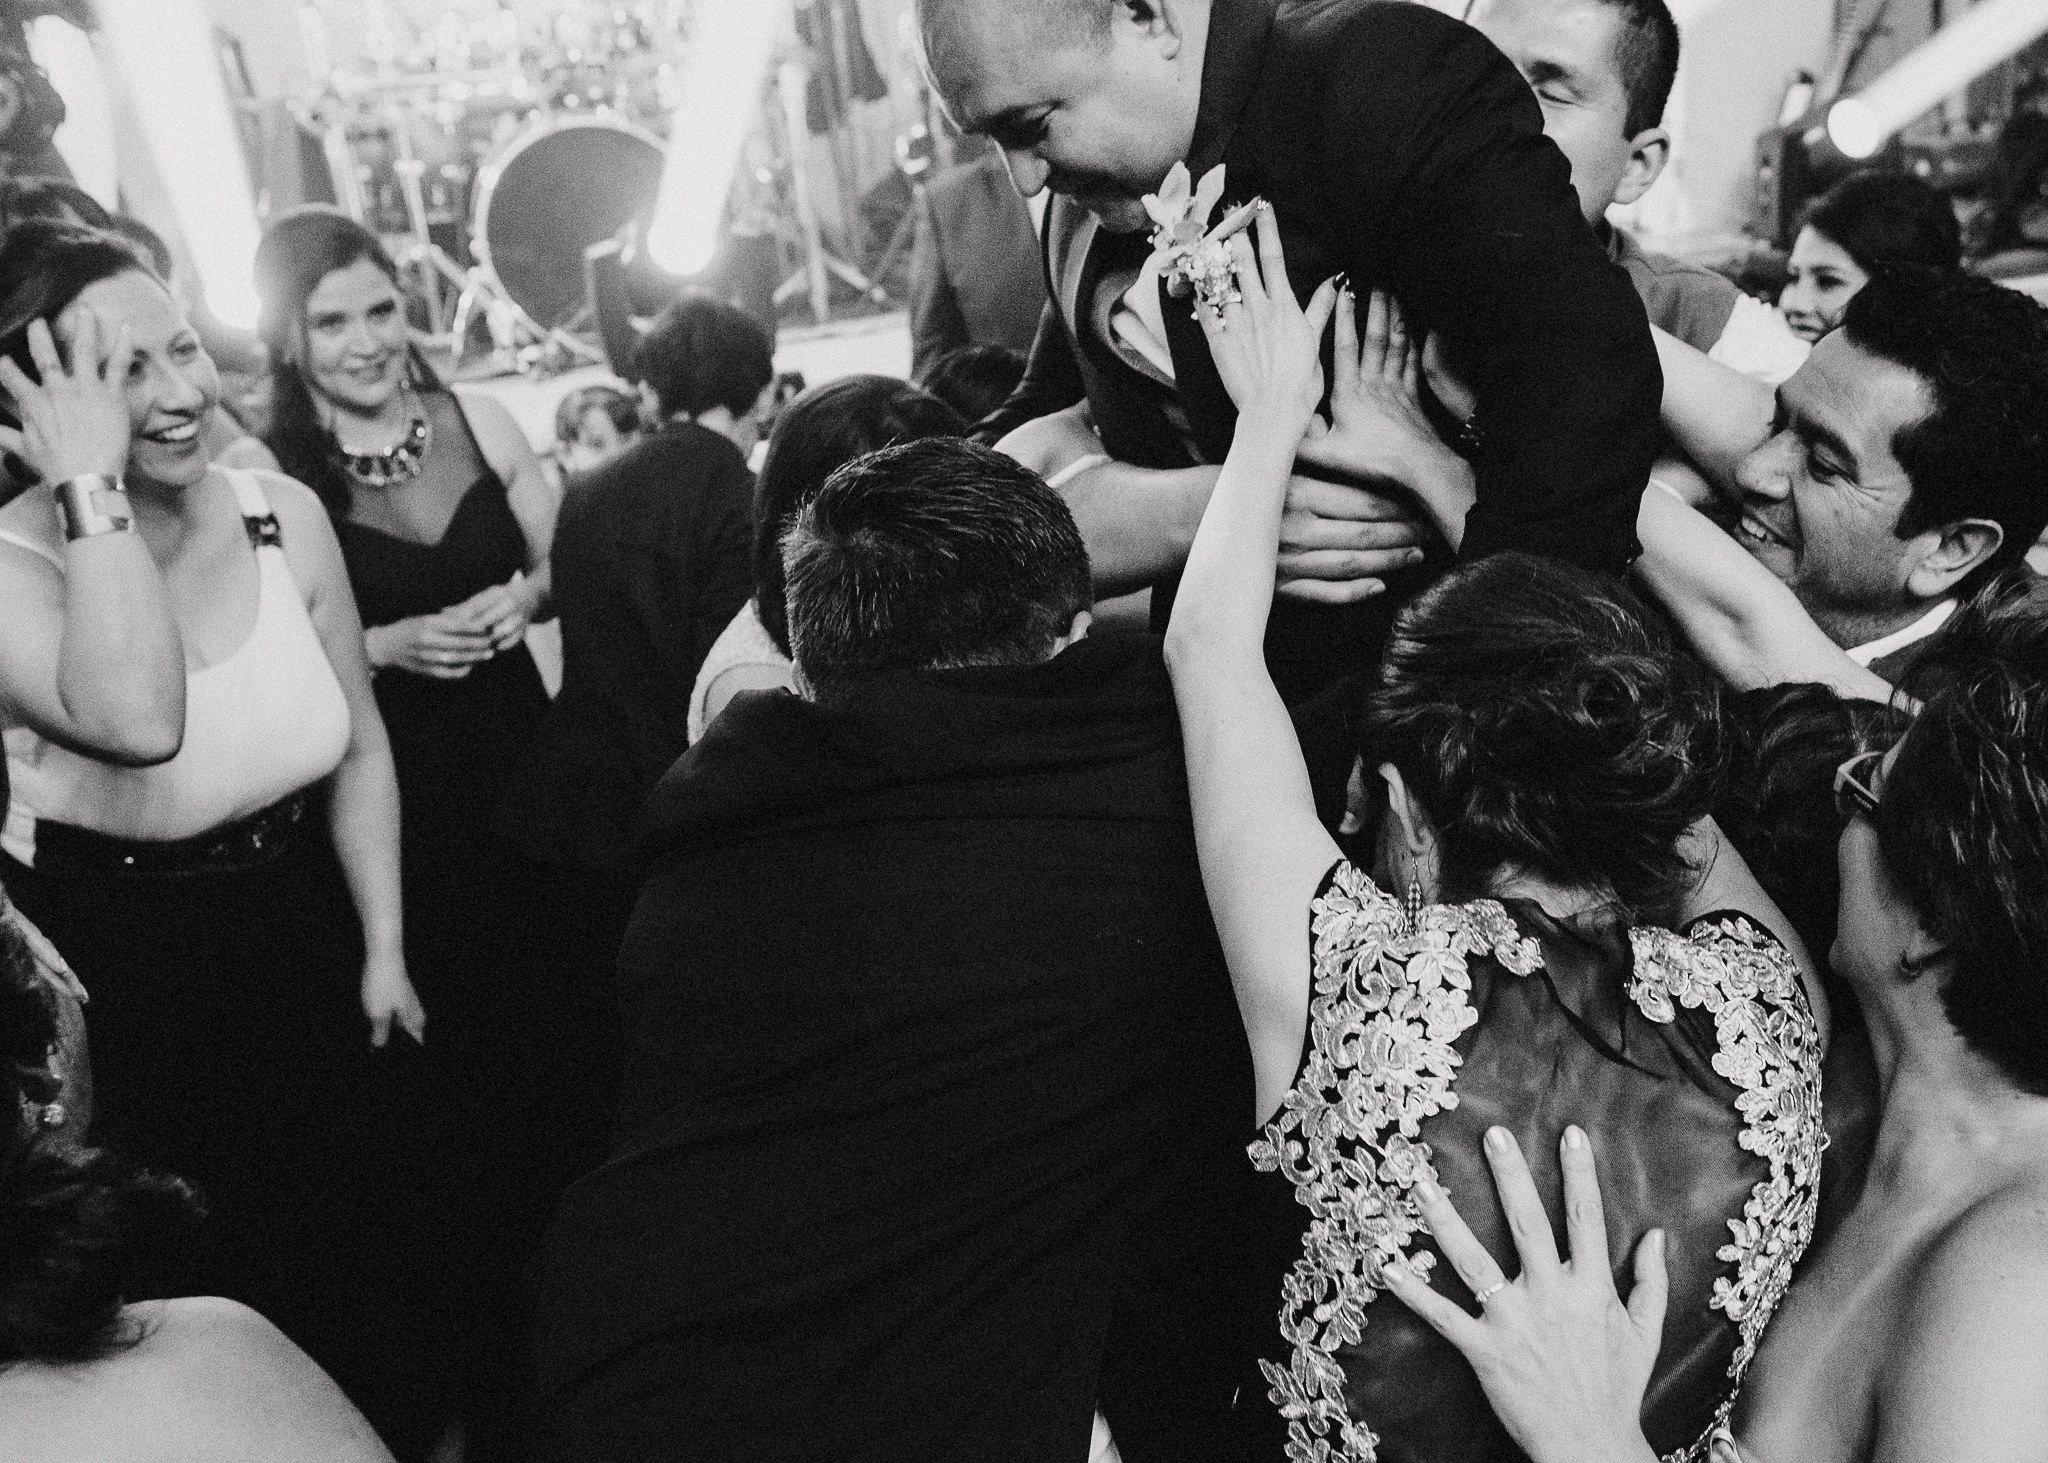 Wedding-Boda-Tulancingo-Hidalgo-Salon-Essenzia-Luis-Houdin-66-film